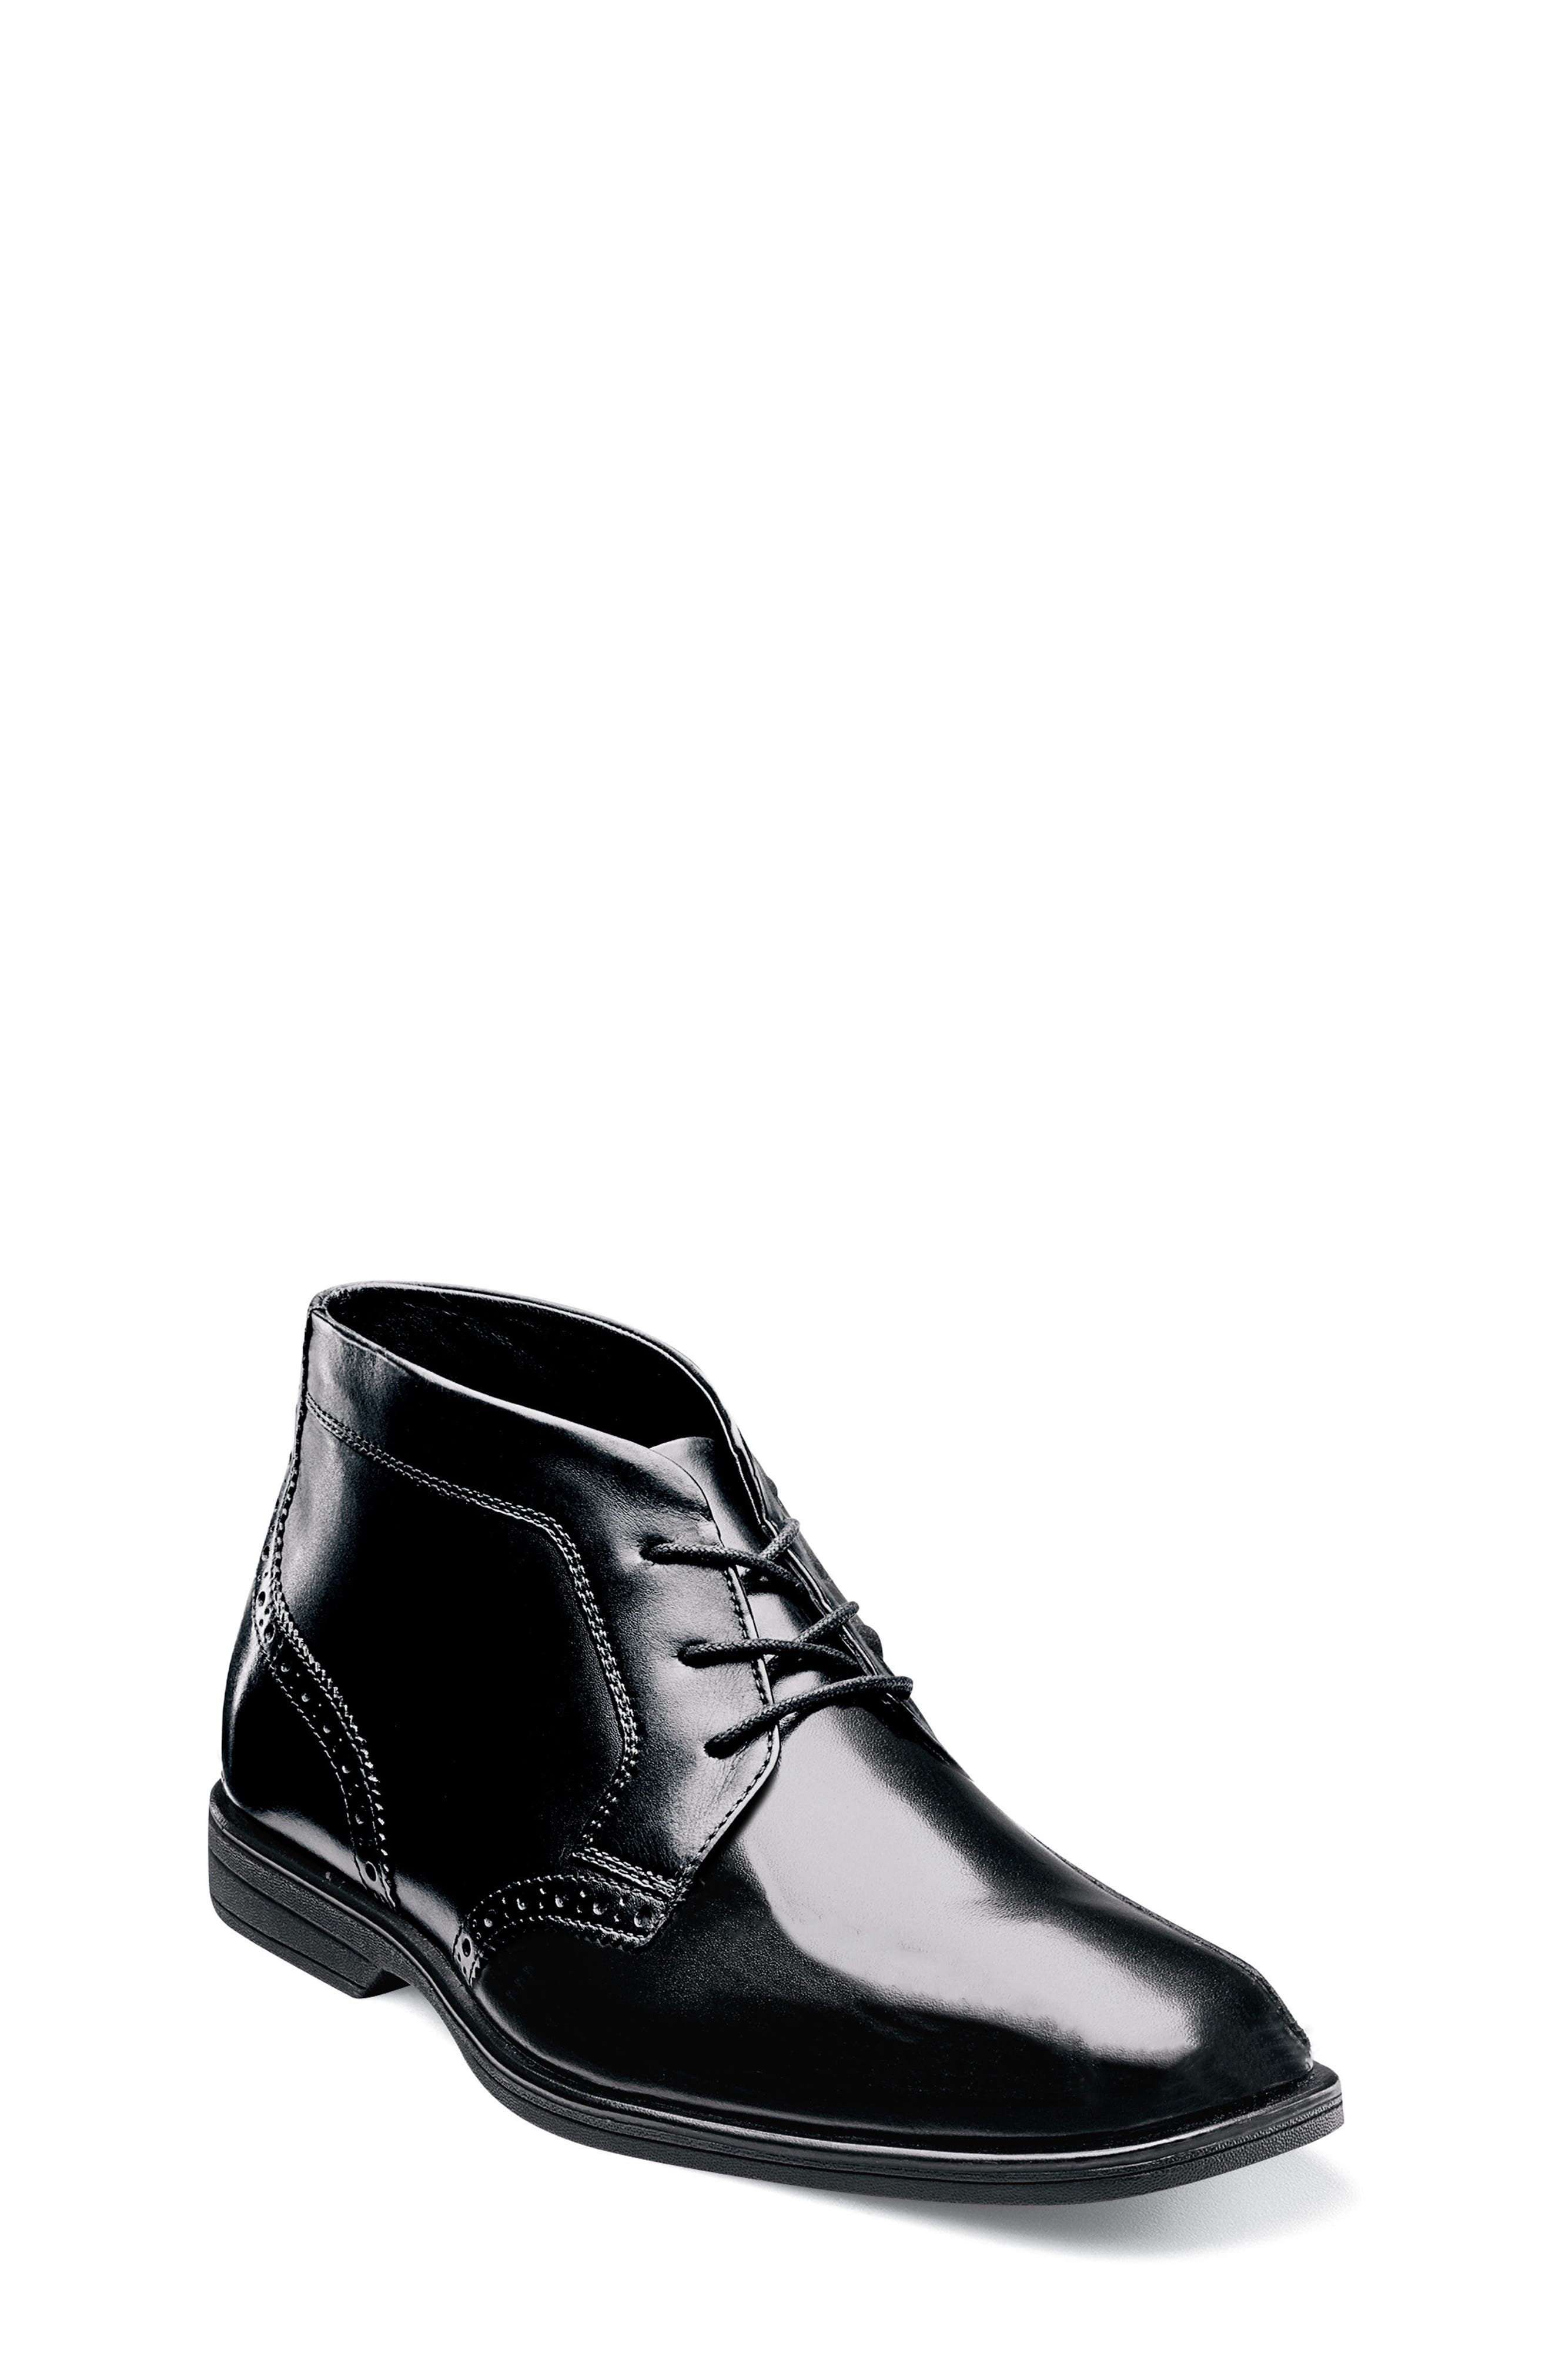 Boys Florsheim Reveal Chukka Boot Size 7 M  Black